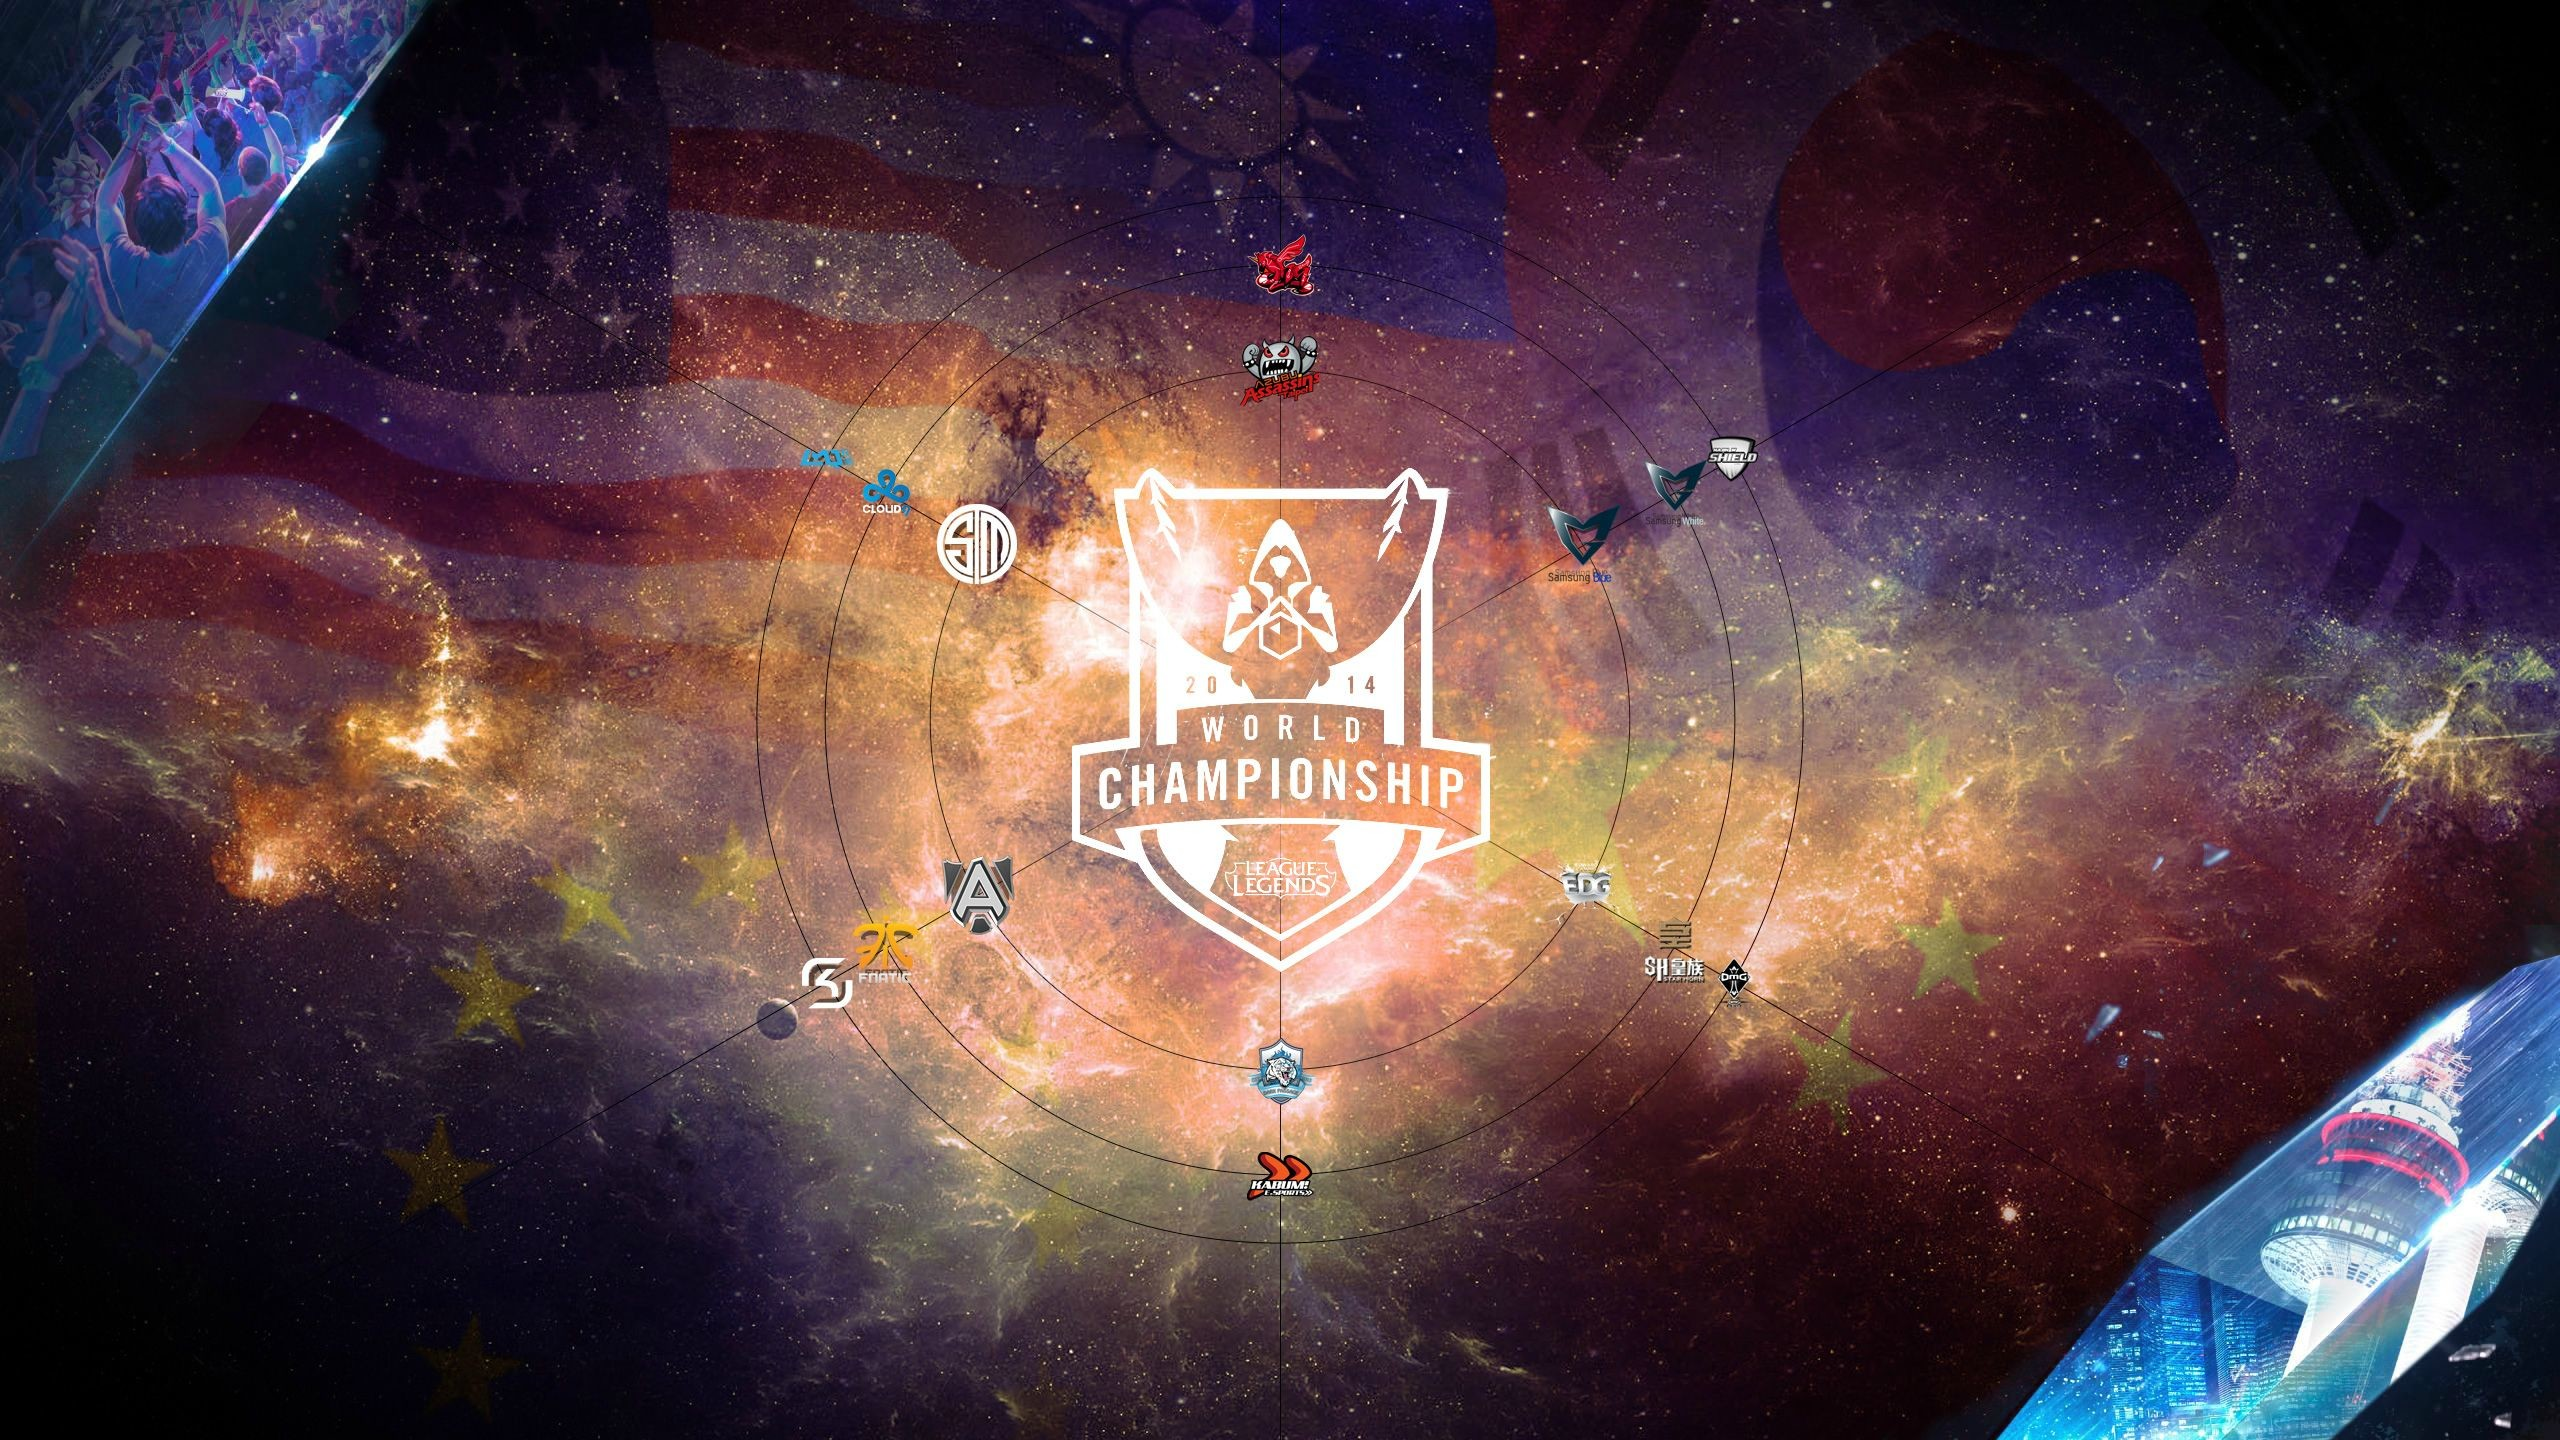 Let the S4 Championship hype begin [Wallpaper] : leagueoflegends